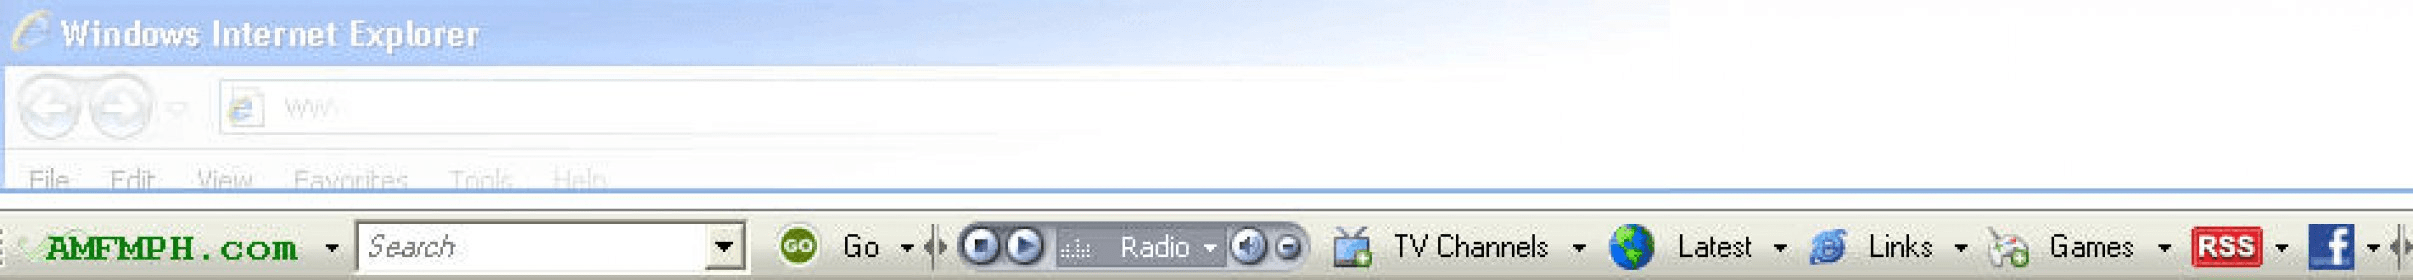 amfmph toolbar